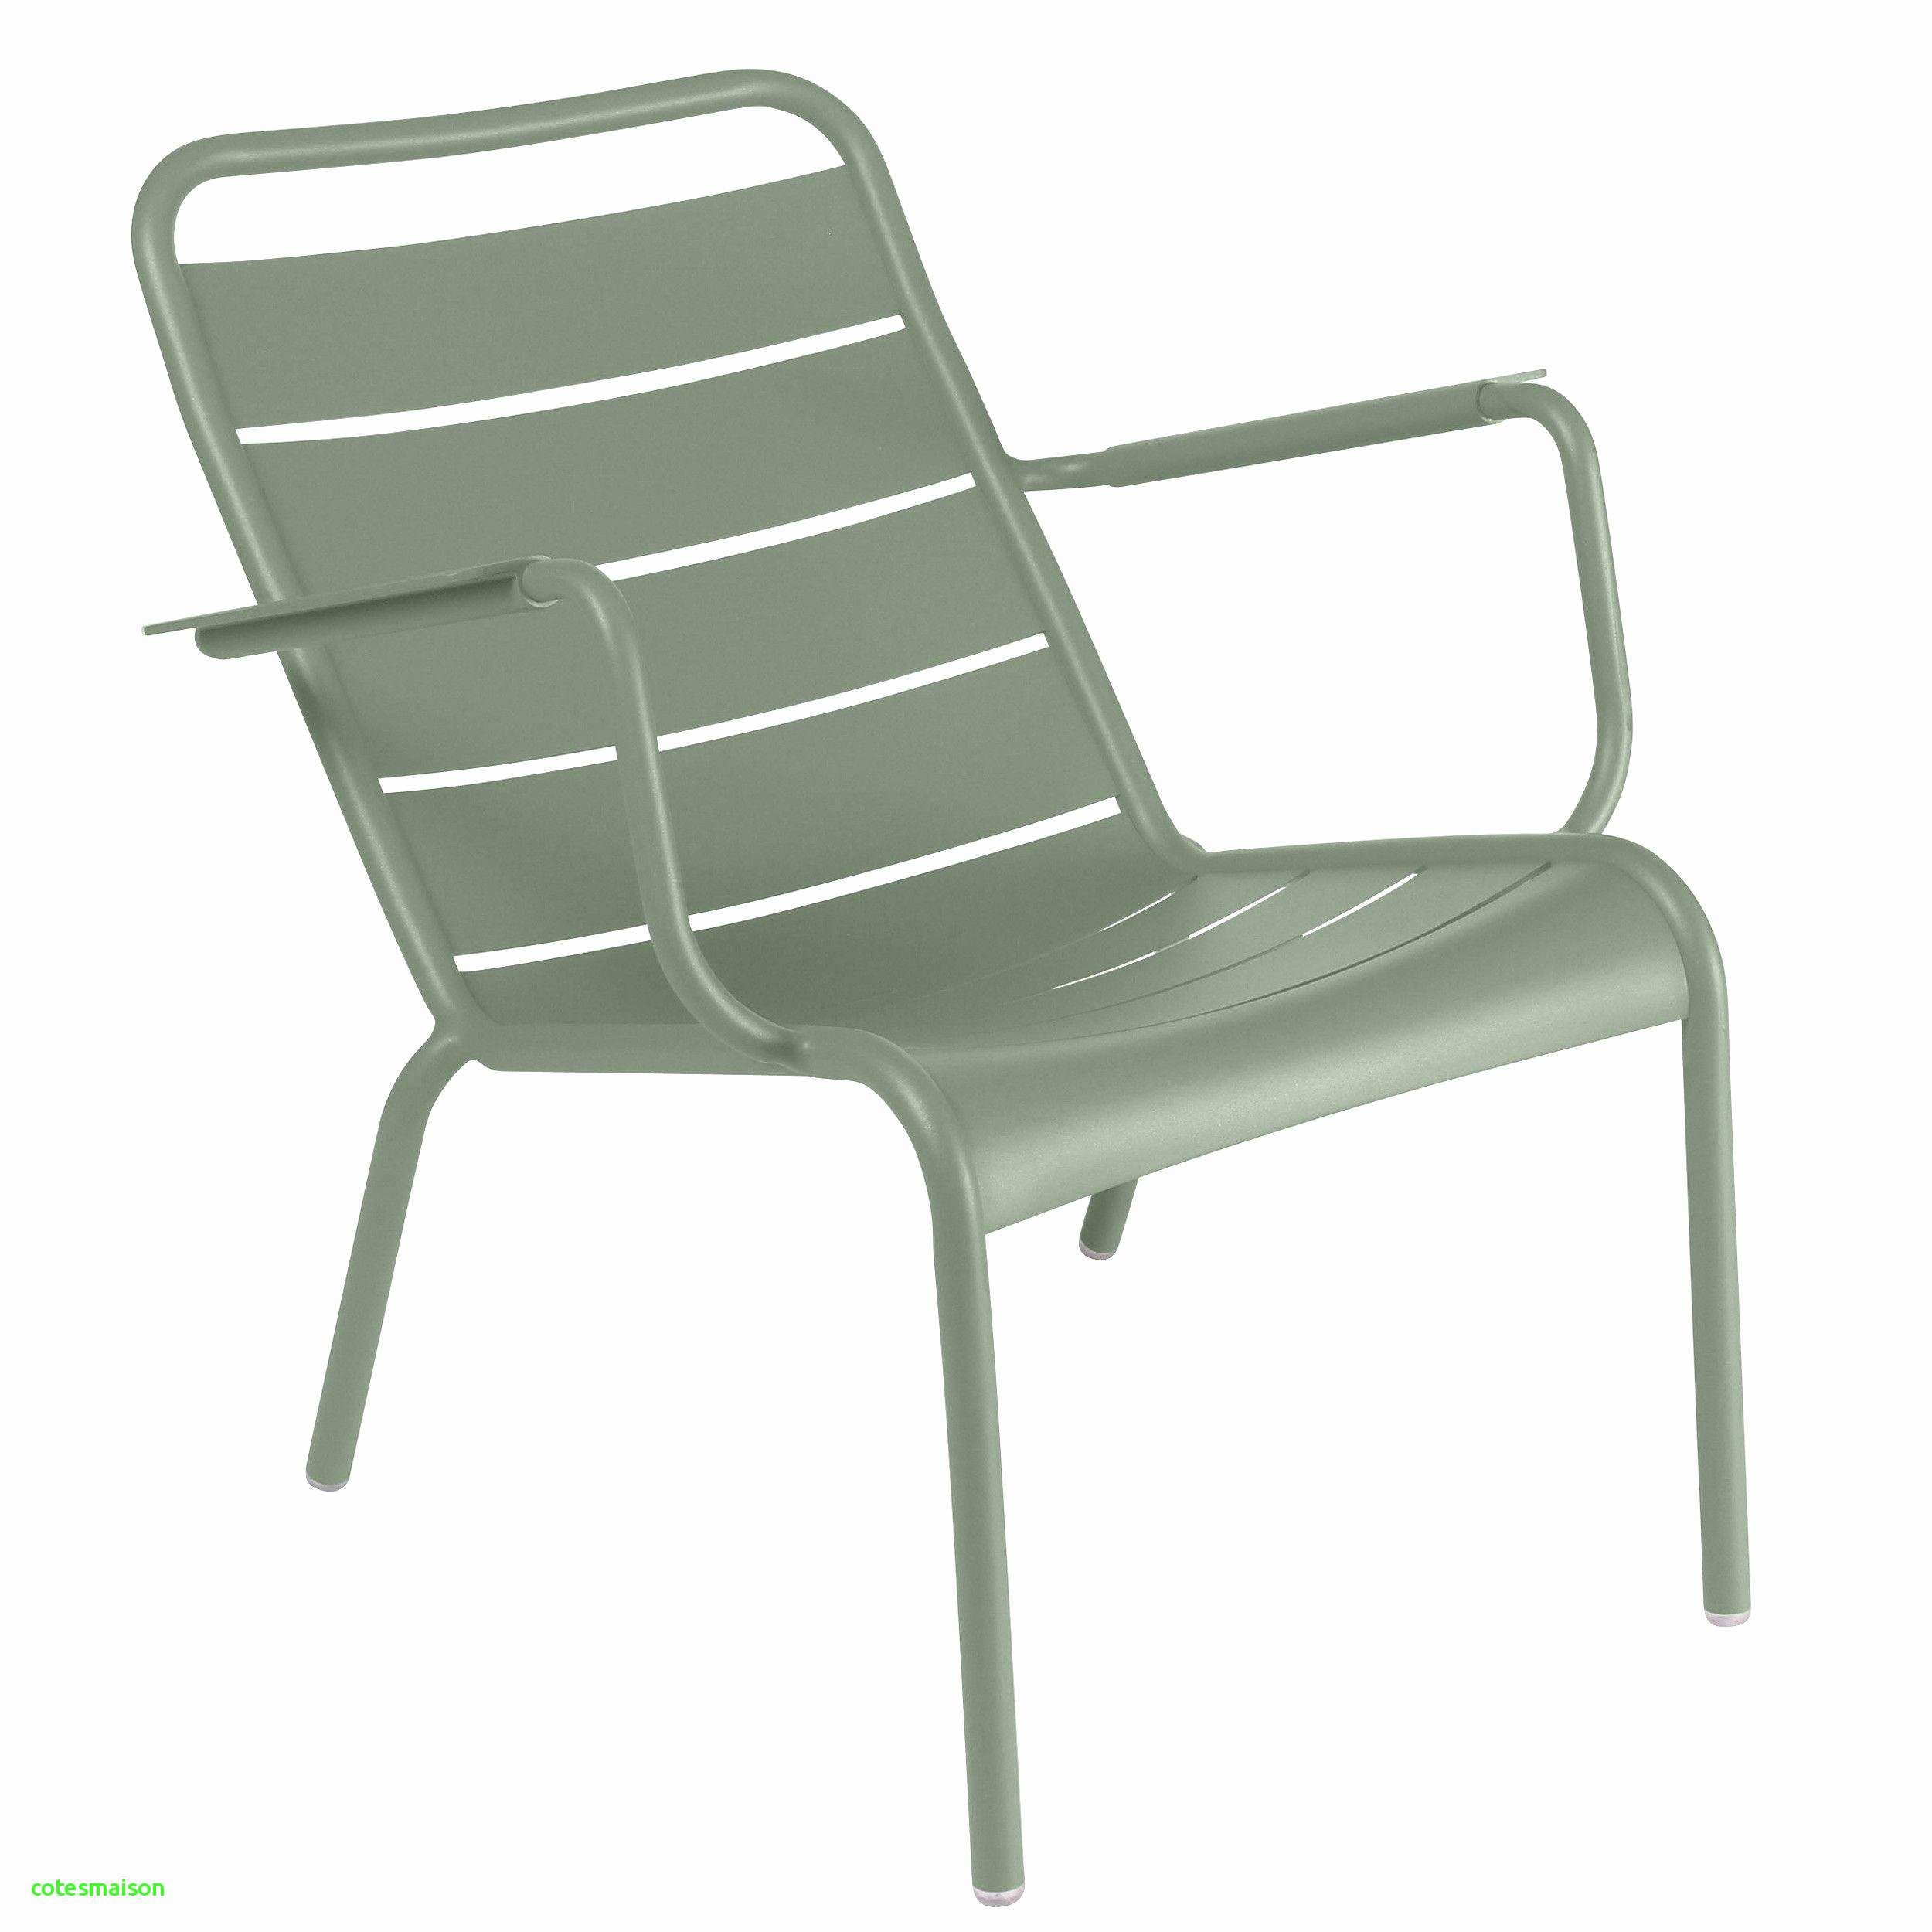 Lit Enfant Bureau De Luxe Chaise Ikea Bureau Chaise Ikea Cuisine Cuisine Fauteuil Salon 0d